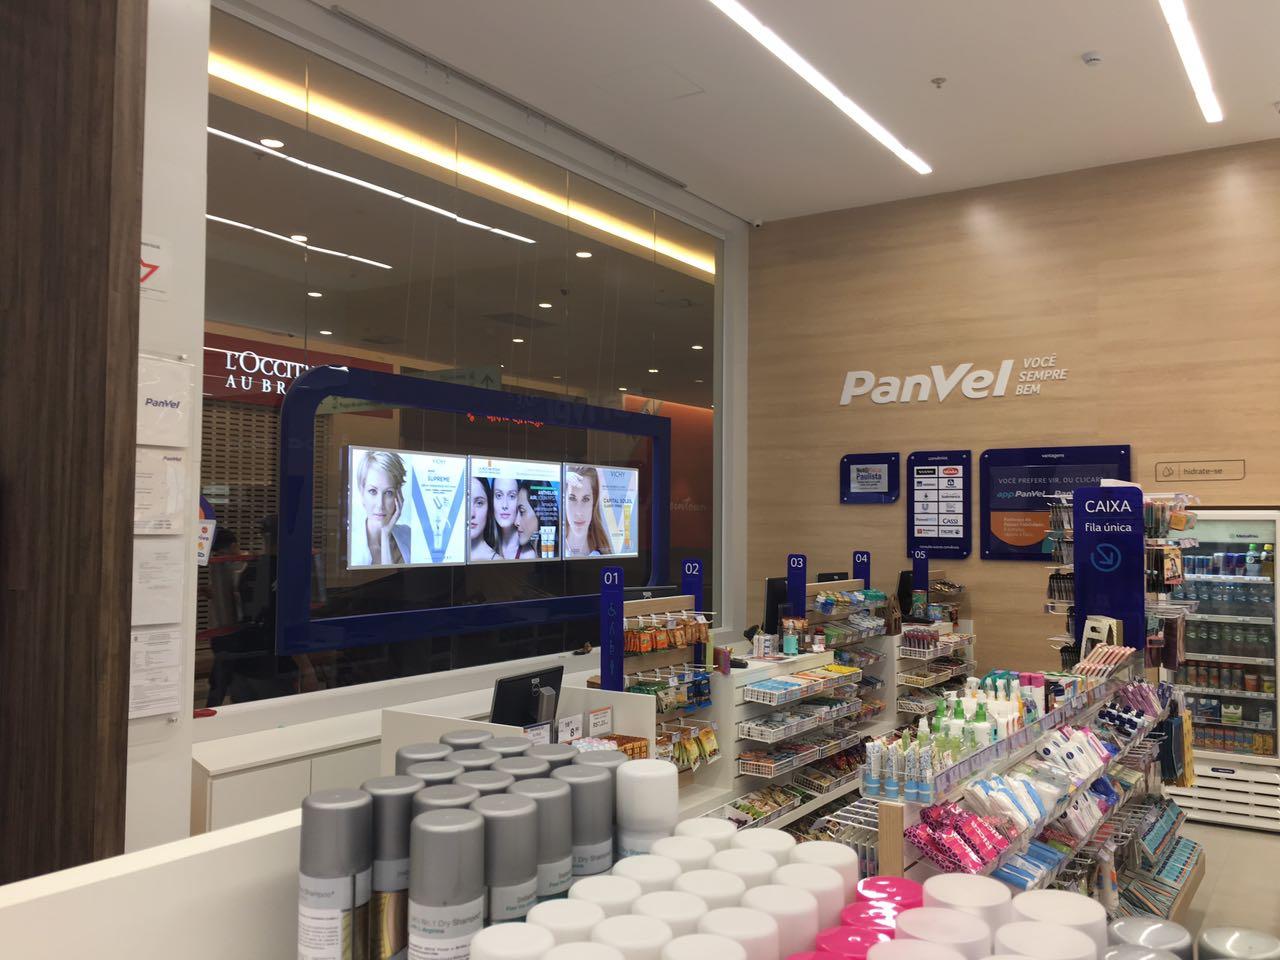 vitrinemedia vm two panvel led window display